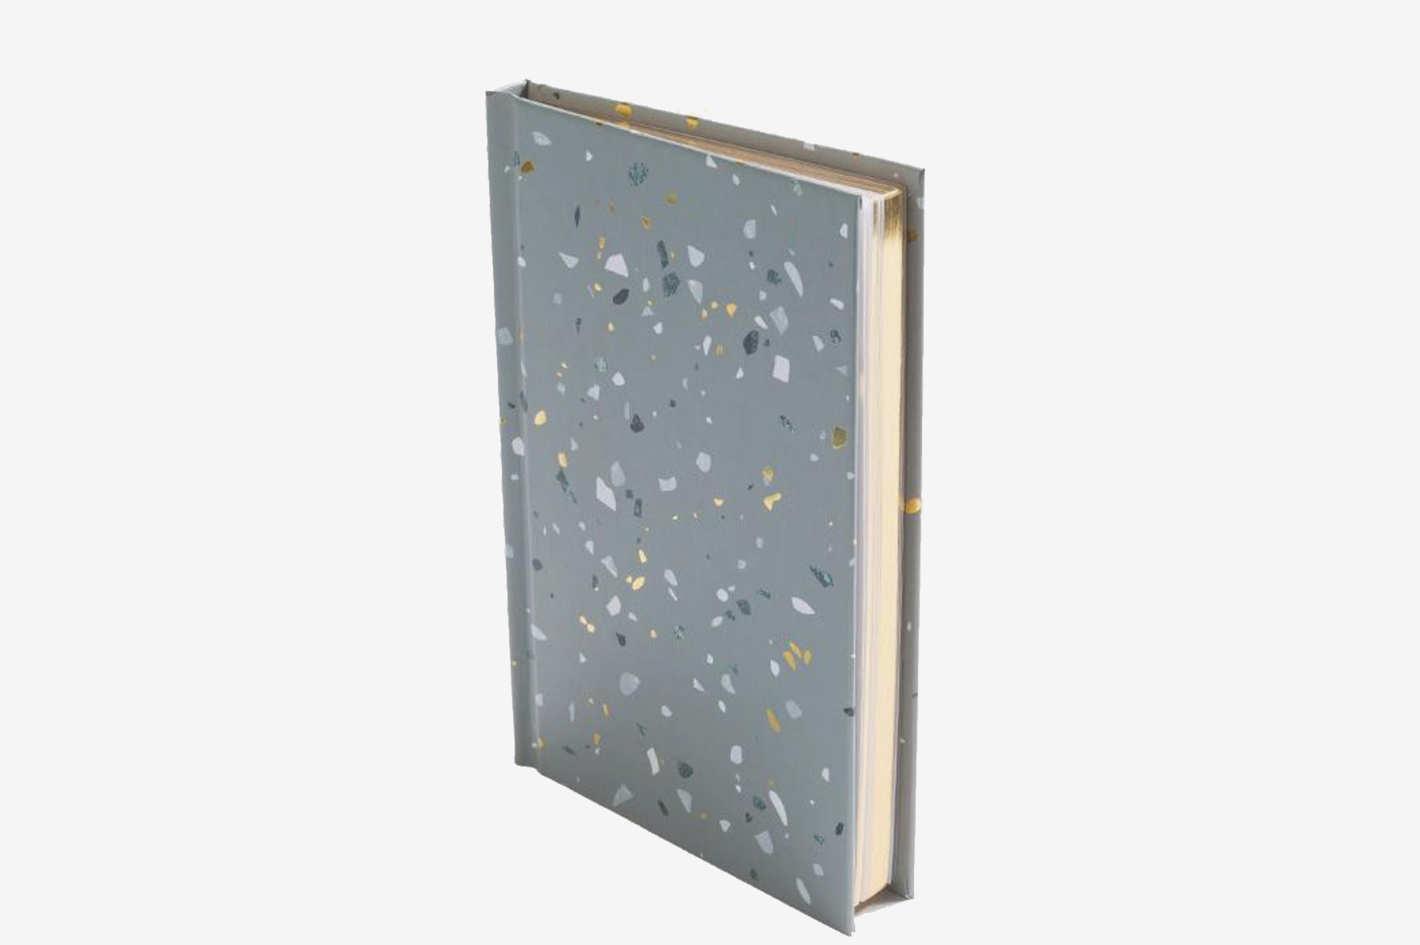 Poketo Terrazzo Notebook in Gray